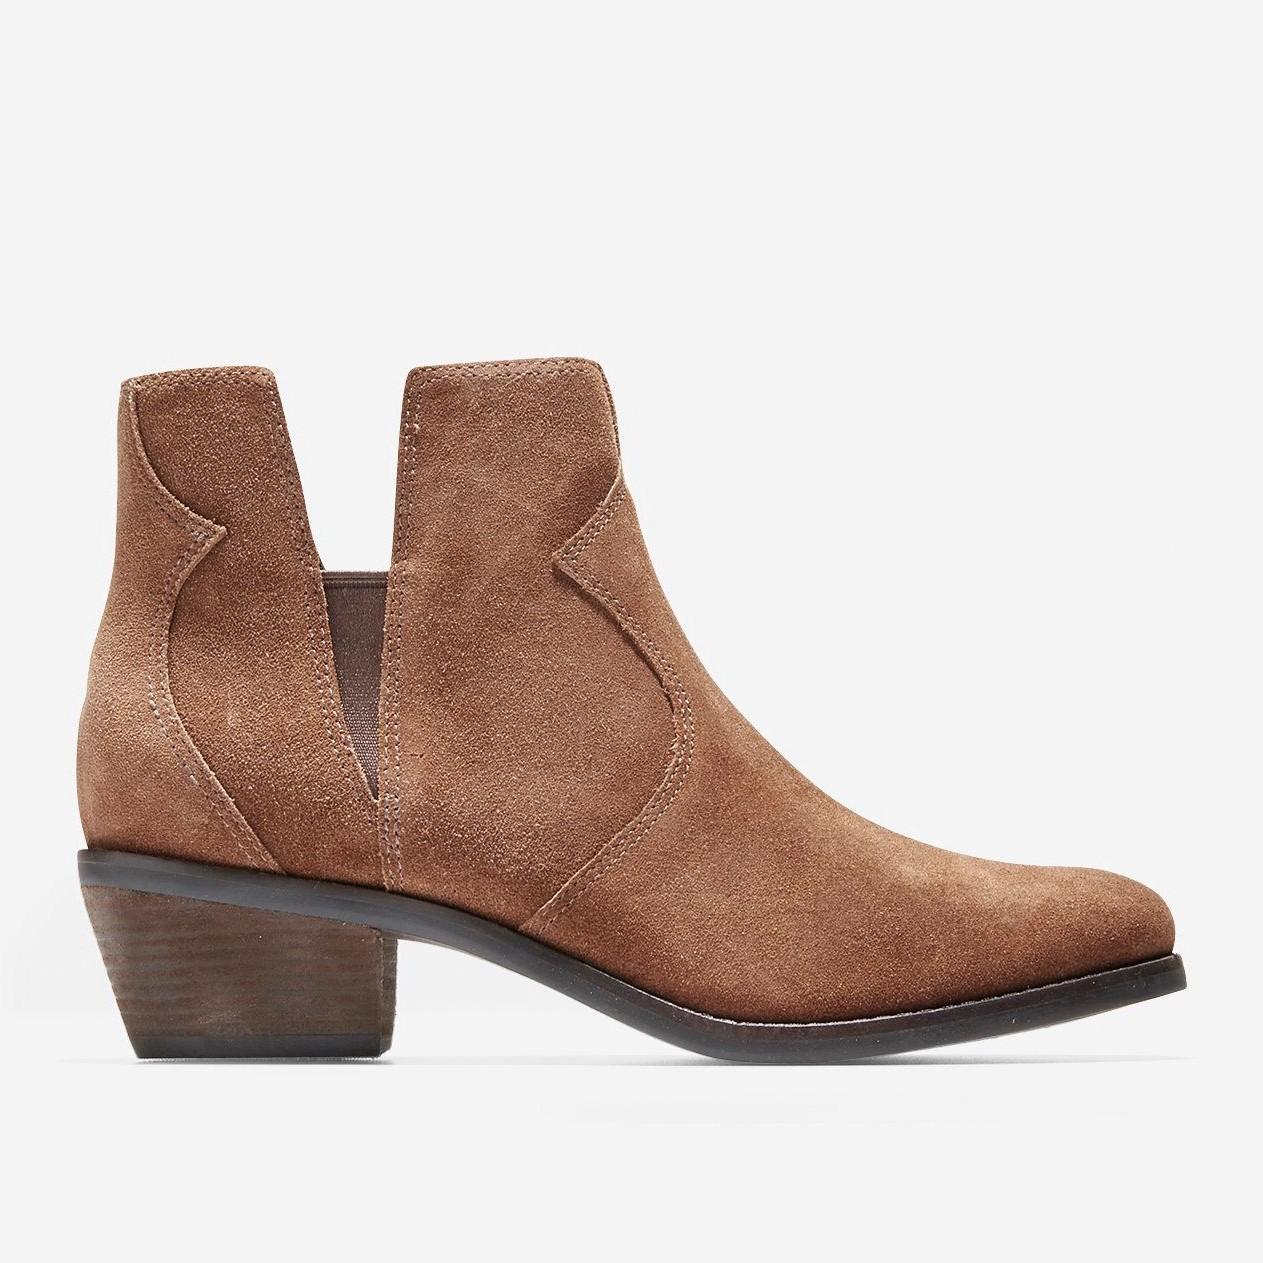 Cole Haan Alayna Block Heel Leather Booties In Brown